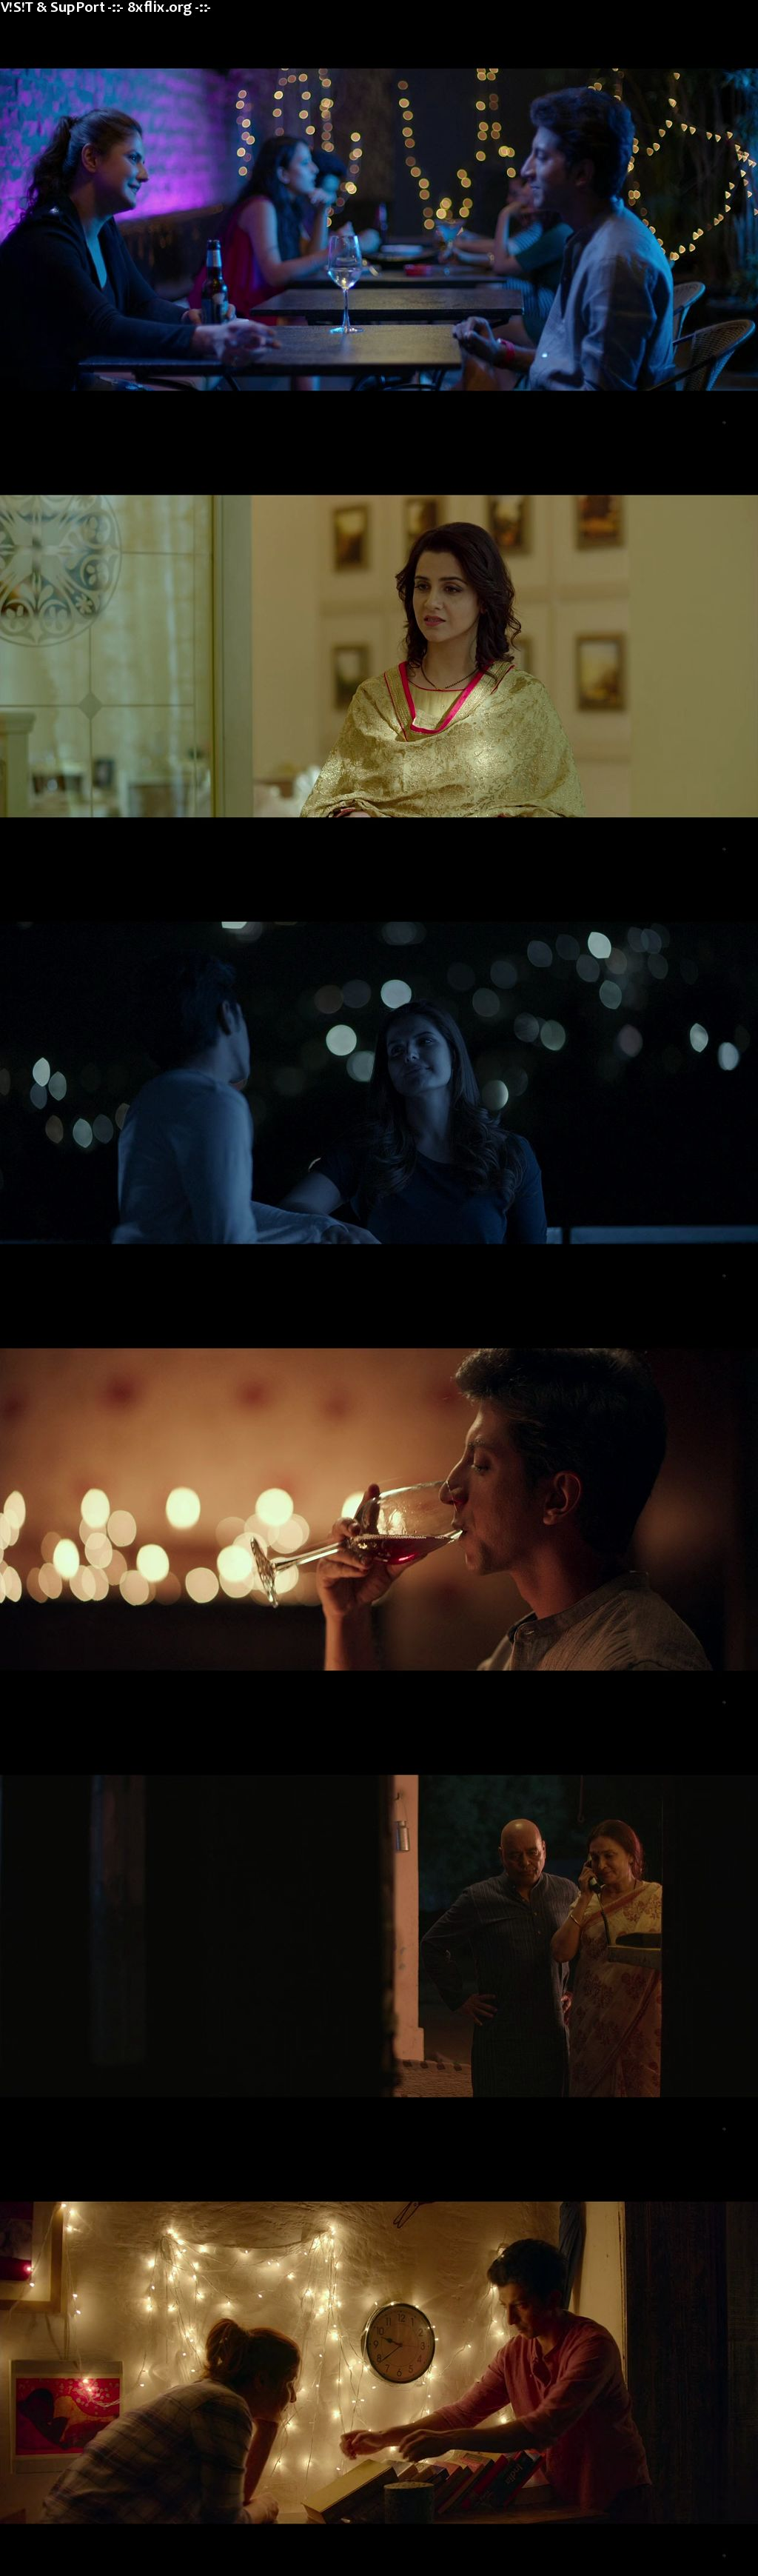 Hum Bhi Akele Tum Bhi Akele 2021 Full Hindi Movie Download 720p 480p Web-DL HD